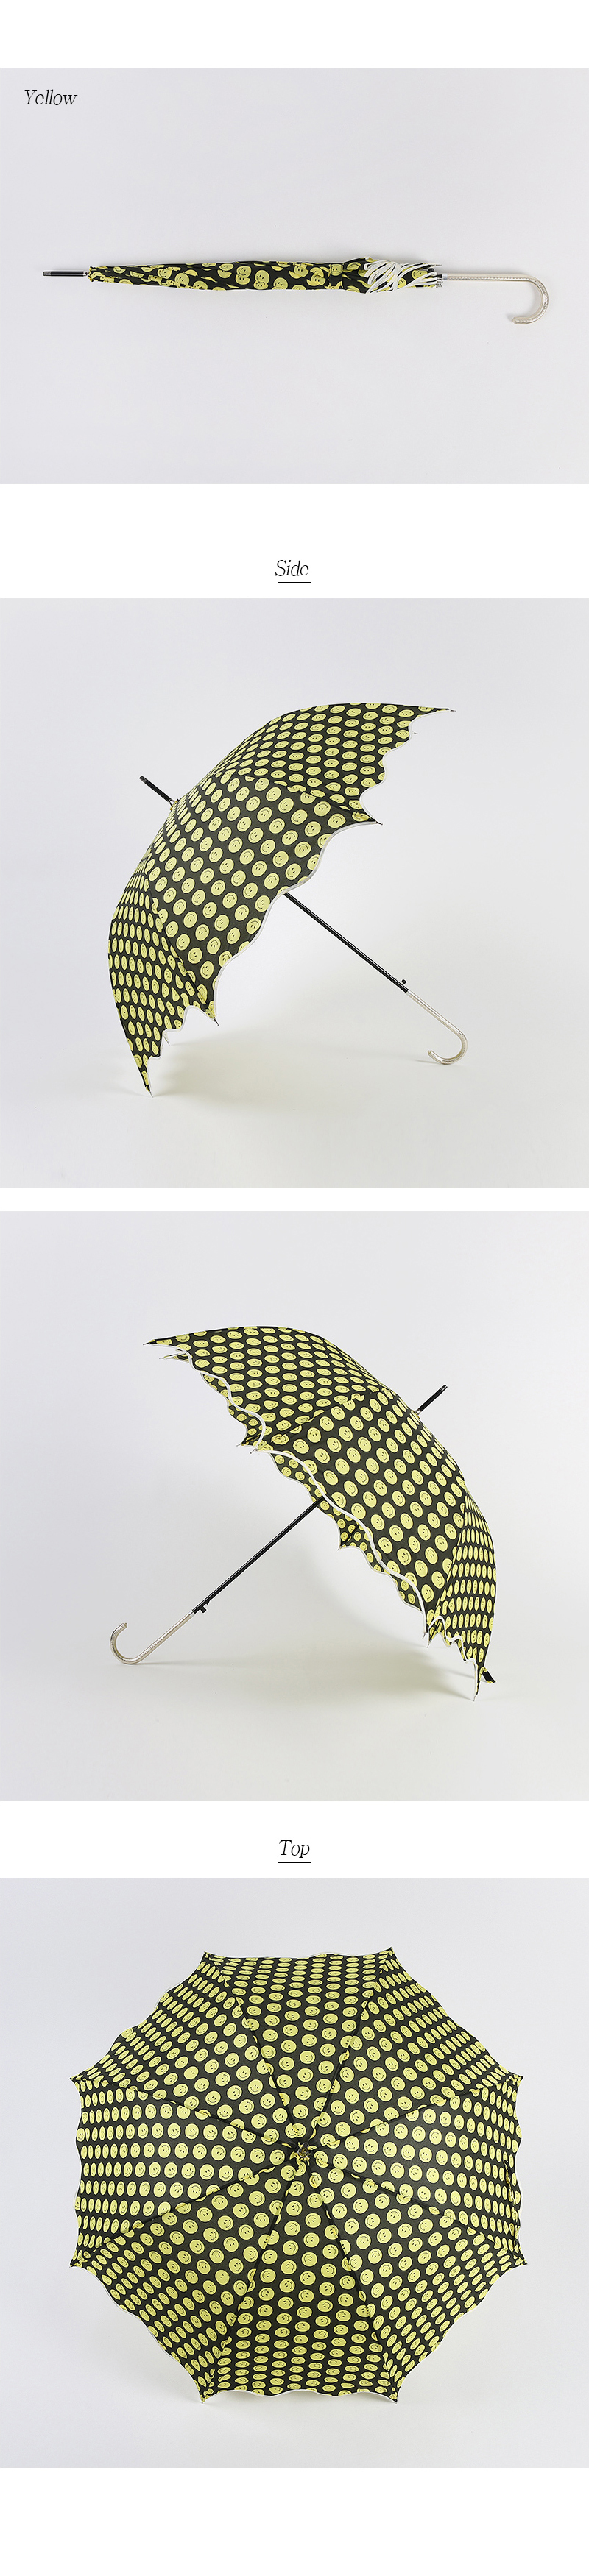 Smile pattern umbrella